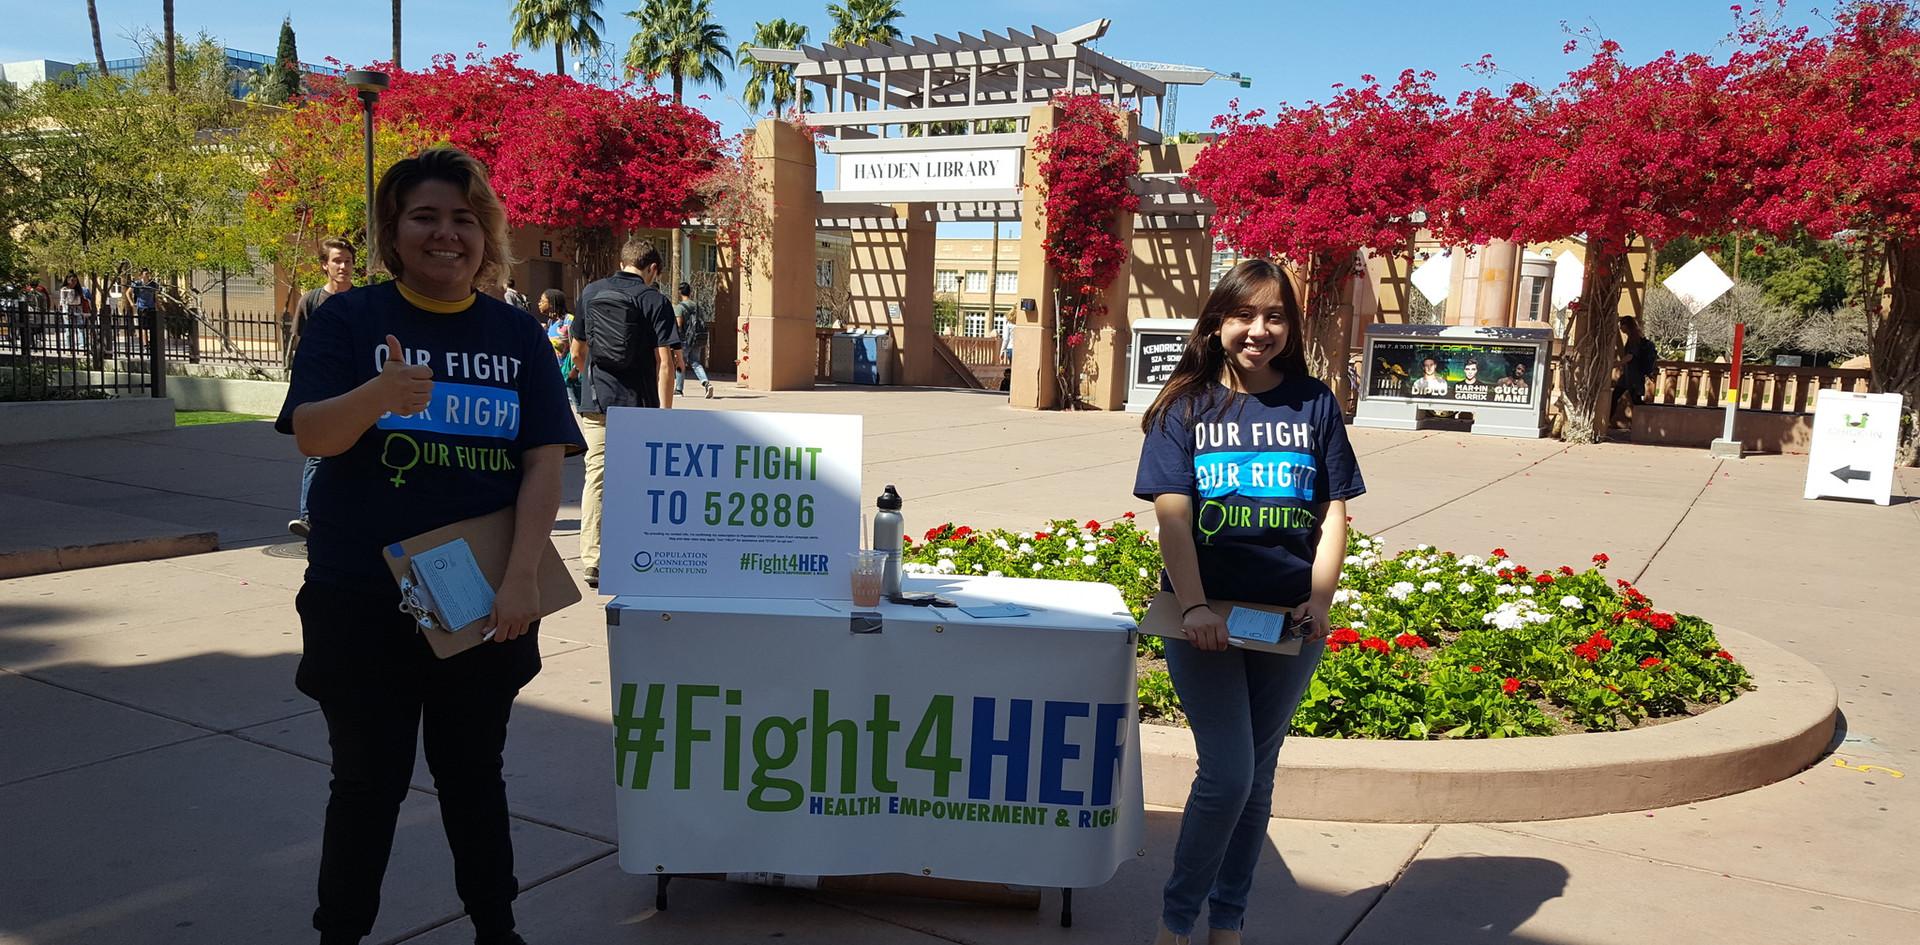 03.12.18.AZ.Fight4HERTabling.jpg